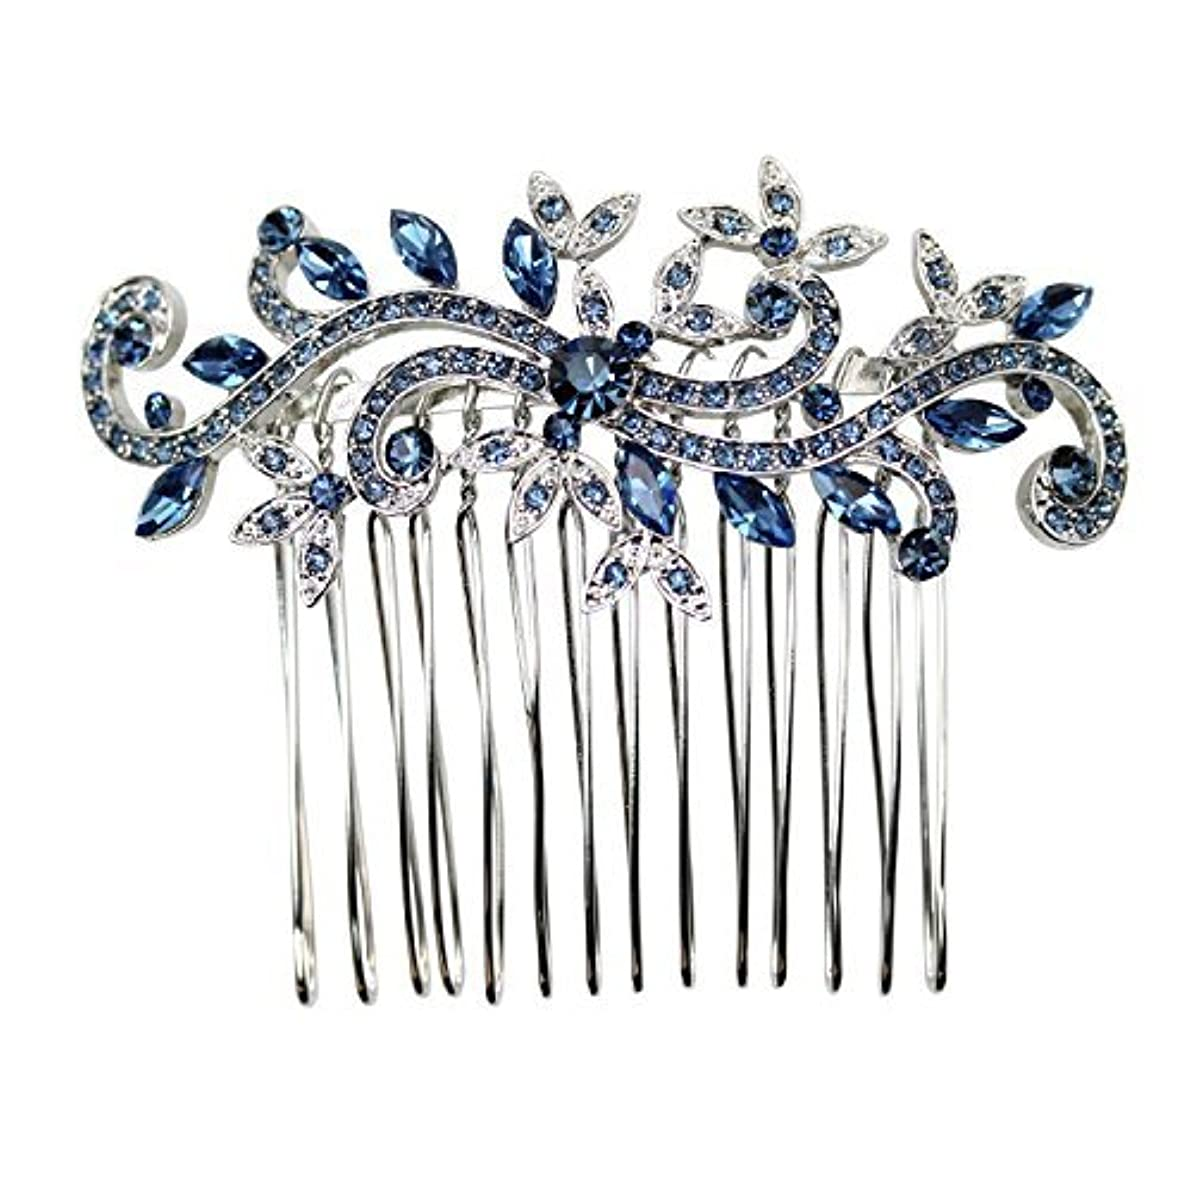 Faship Gorgeous Navy Blue Crystal Floral Hair Comb [並行輸入品]